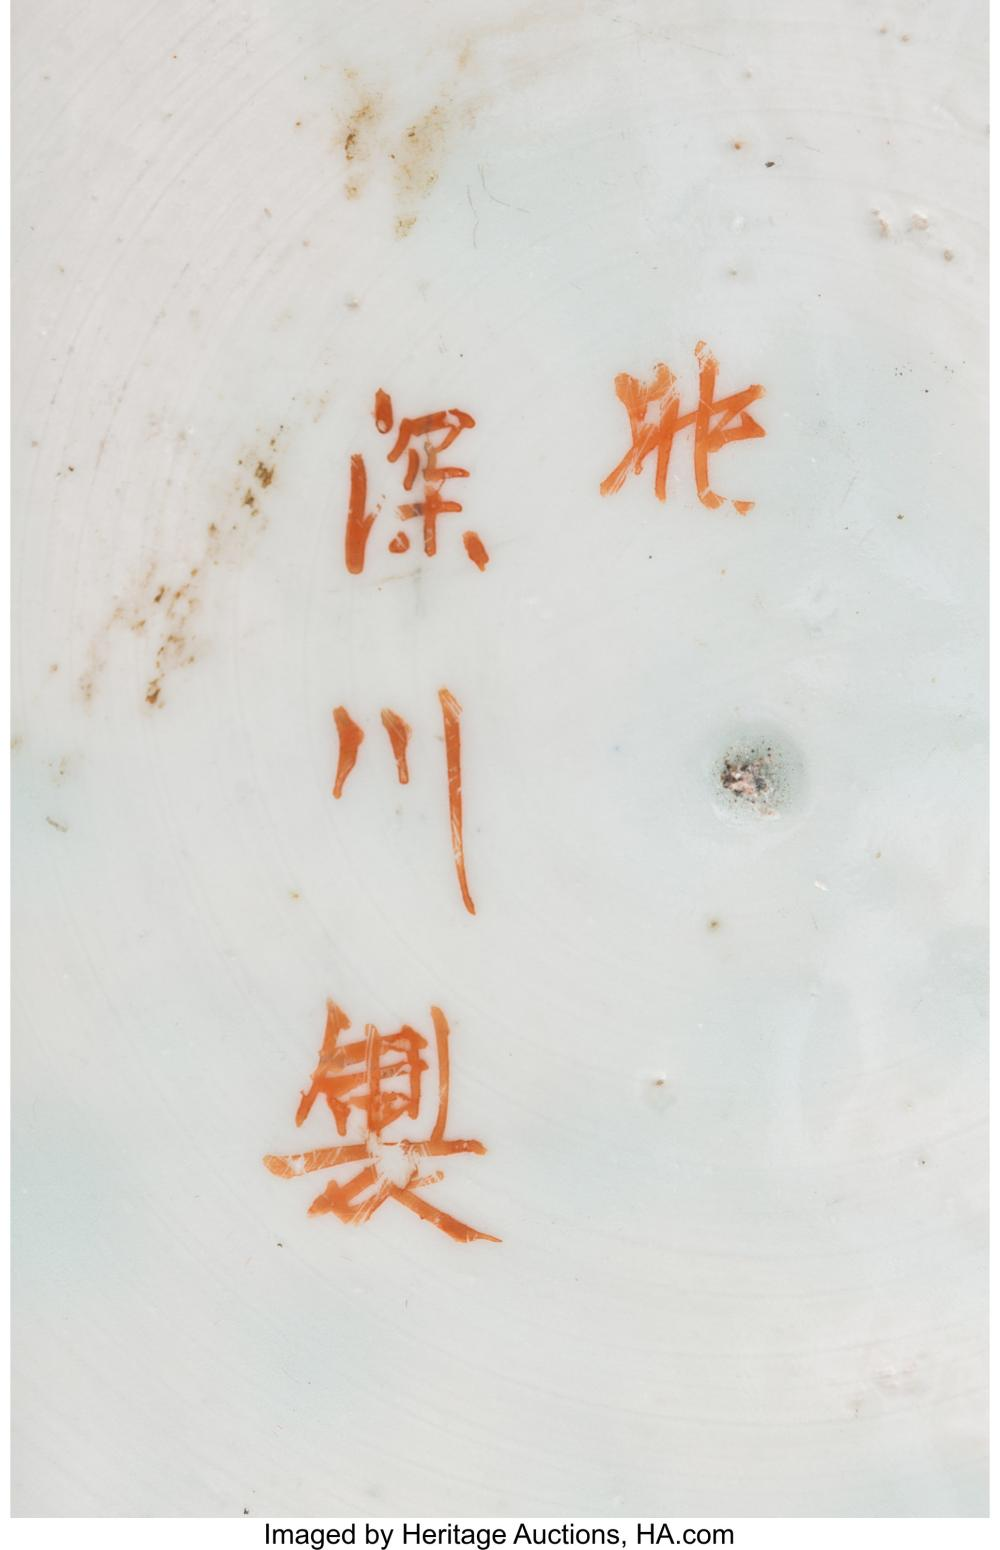 Lot 21253: A Japanese Partial Gilt Enameled Kutani Porcelain Floor Vase, Meiji Period Marks